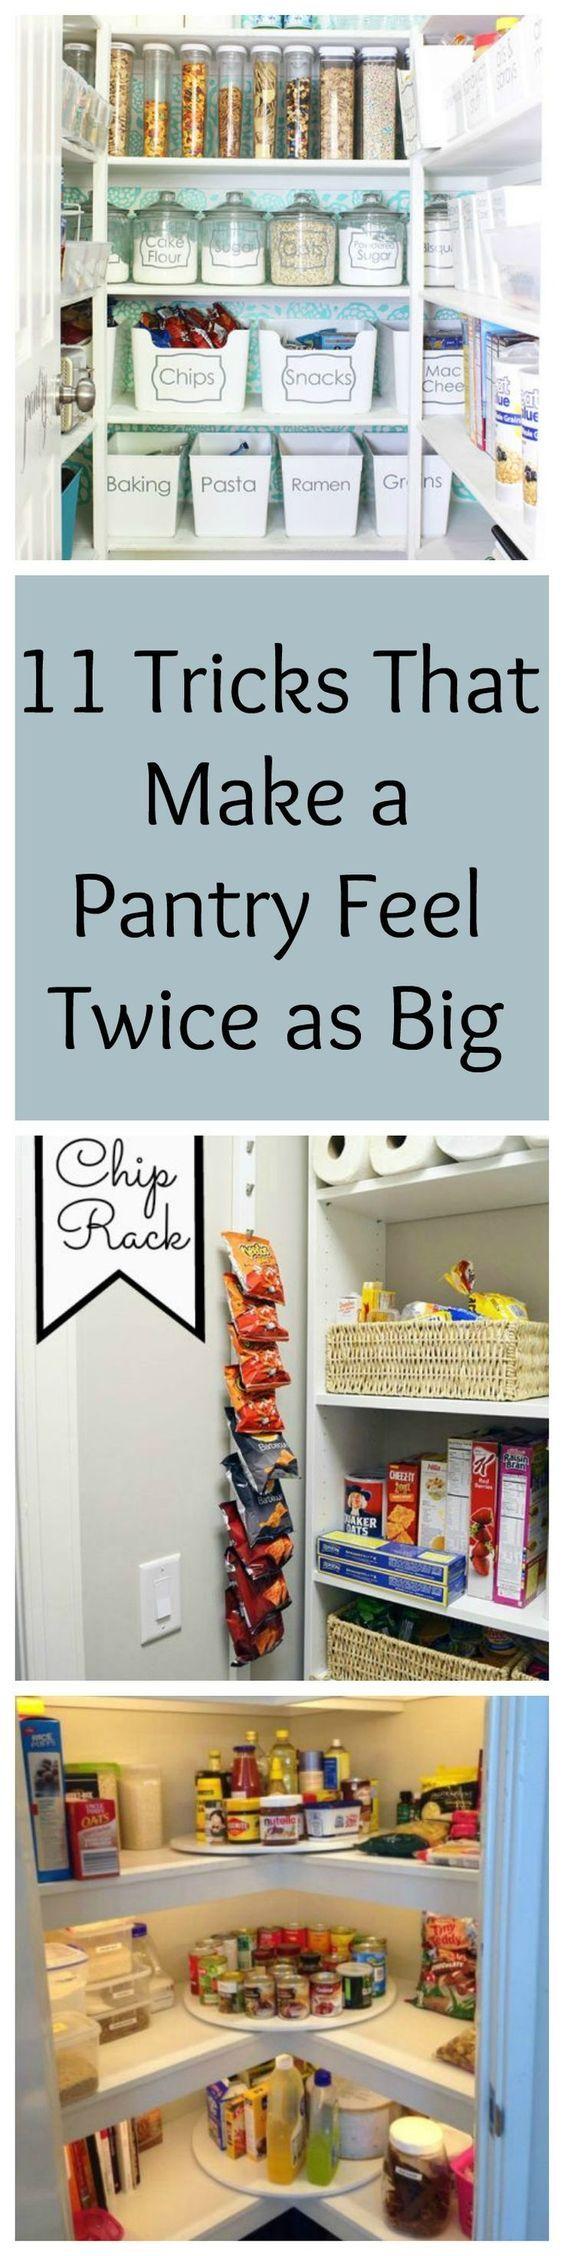 11 organization tricks that make a pantry feel twice as big - Kitchen Pantry Organization Ideas